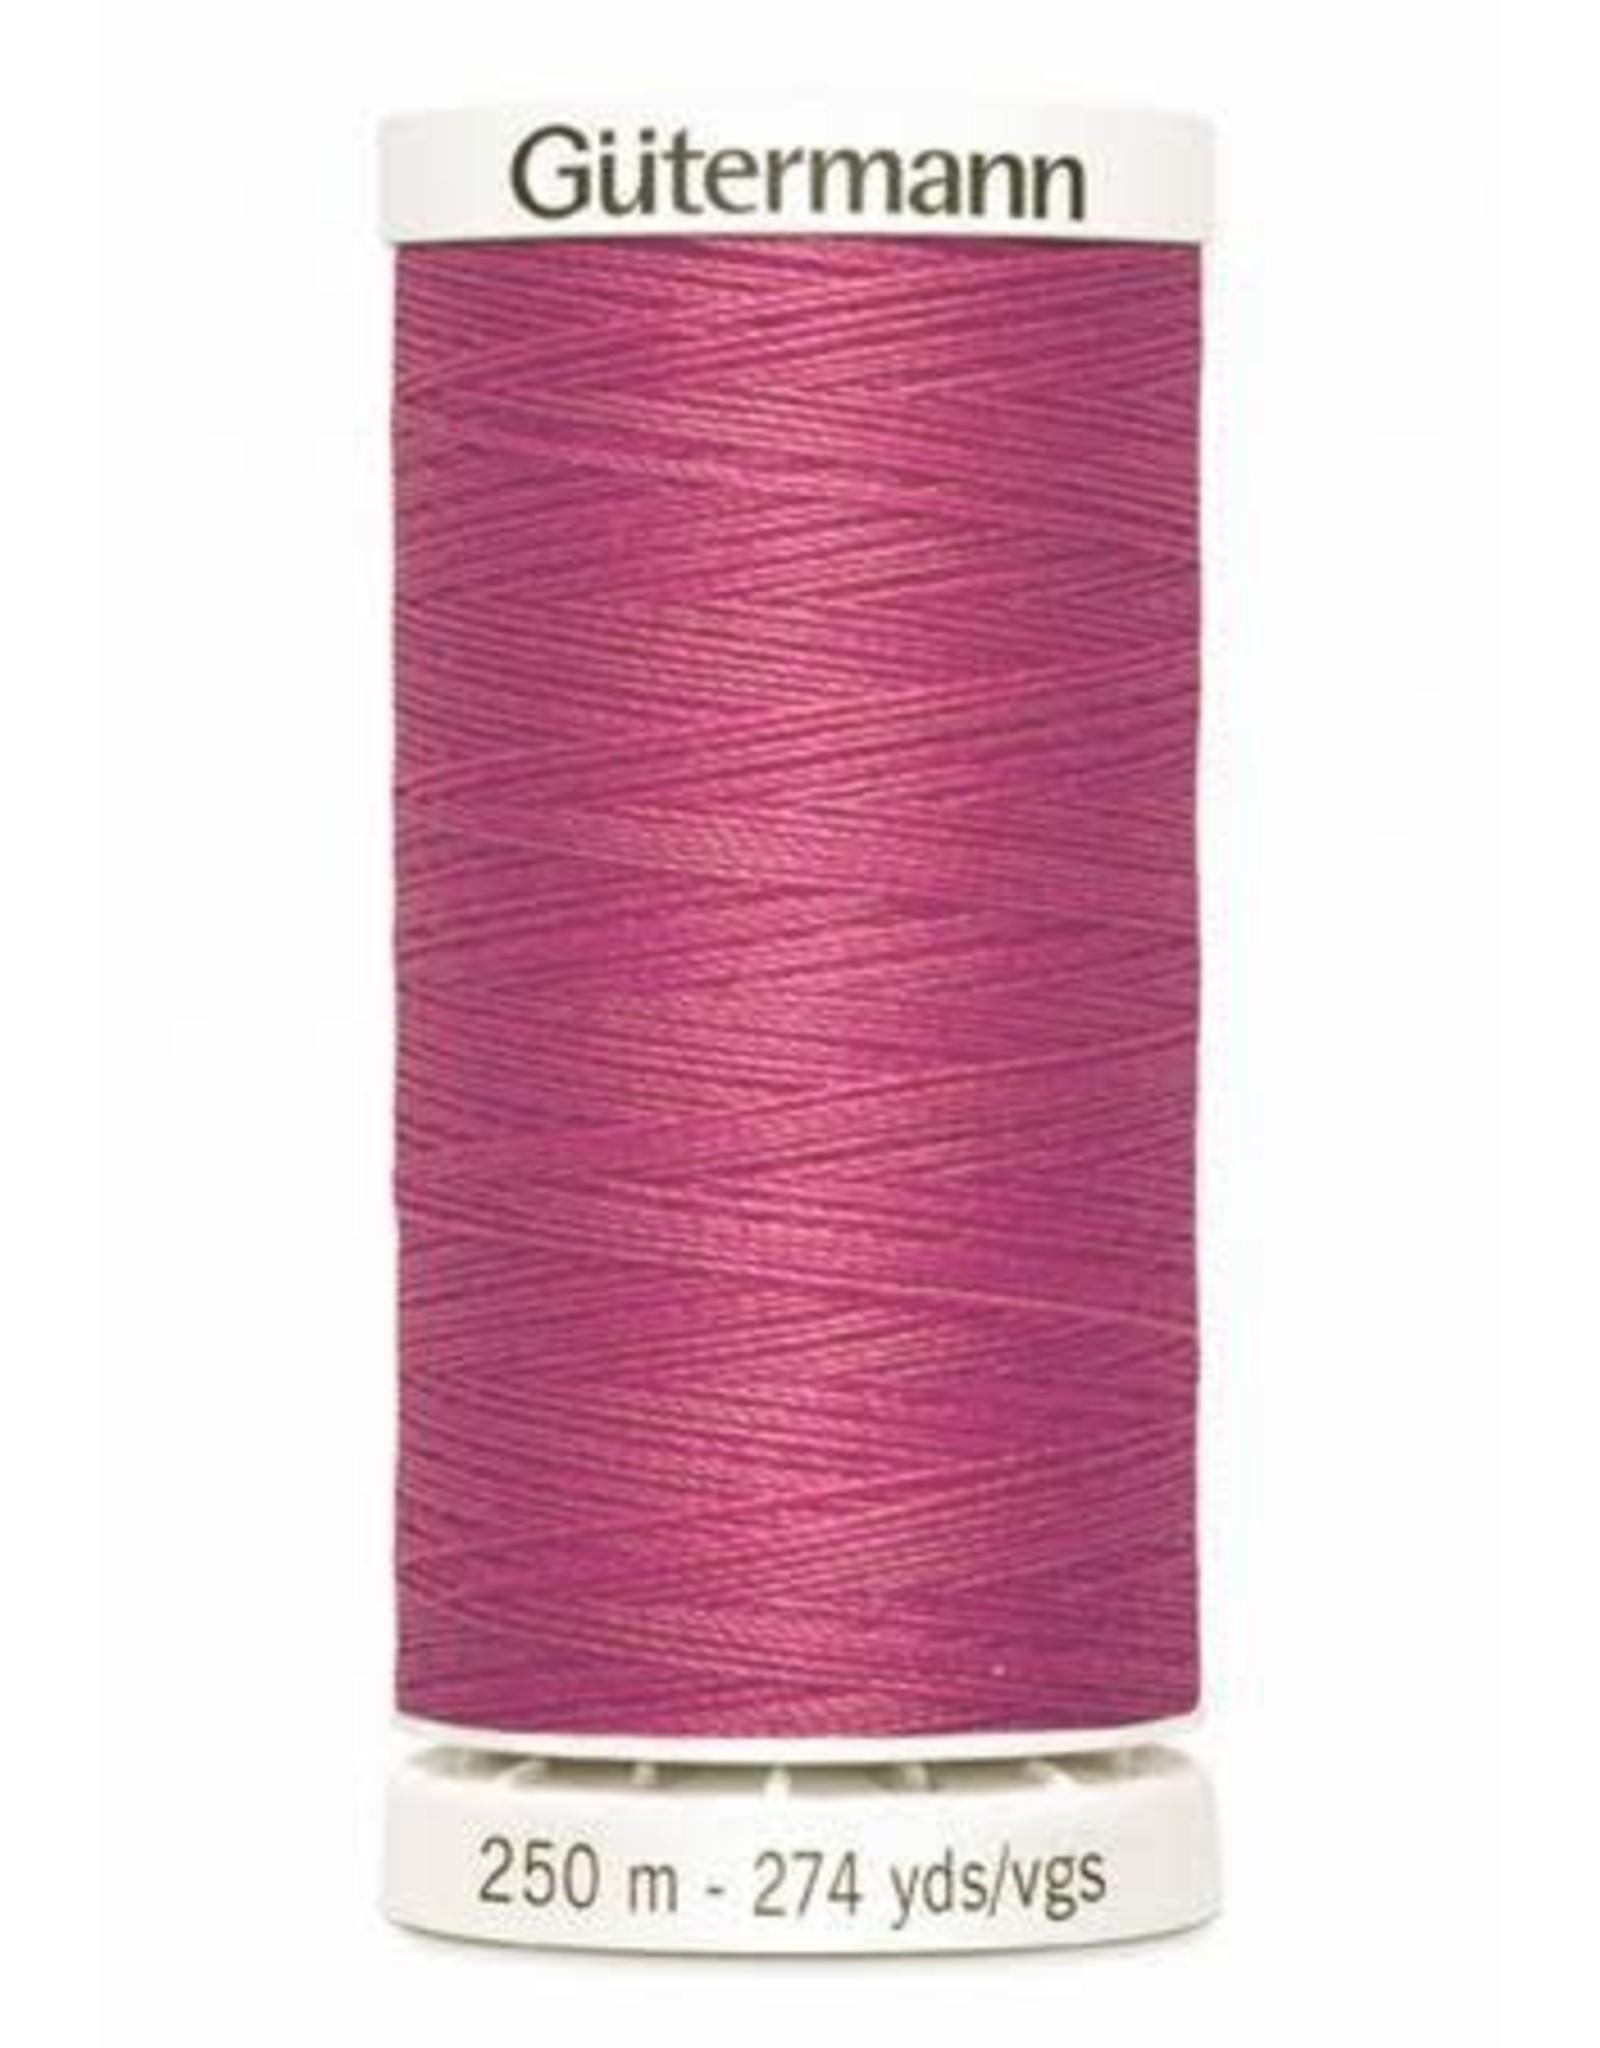 Gutermann Gutermann Thread, 250M-320 Dusty Rose, Sew-All Polyester All Purpose Thread, 250m/273yds